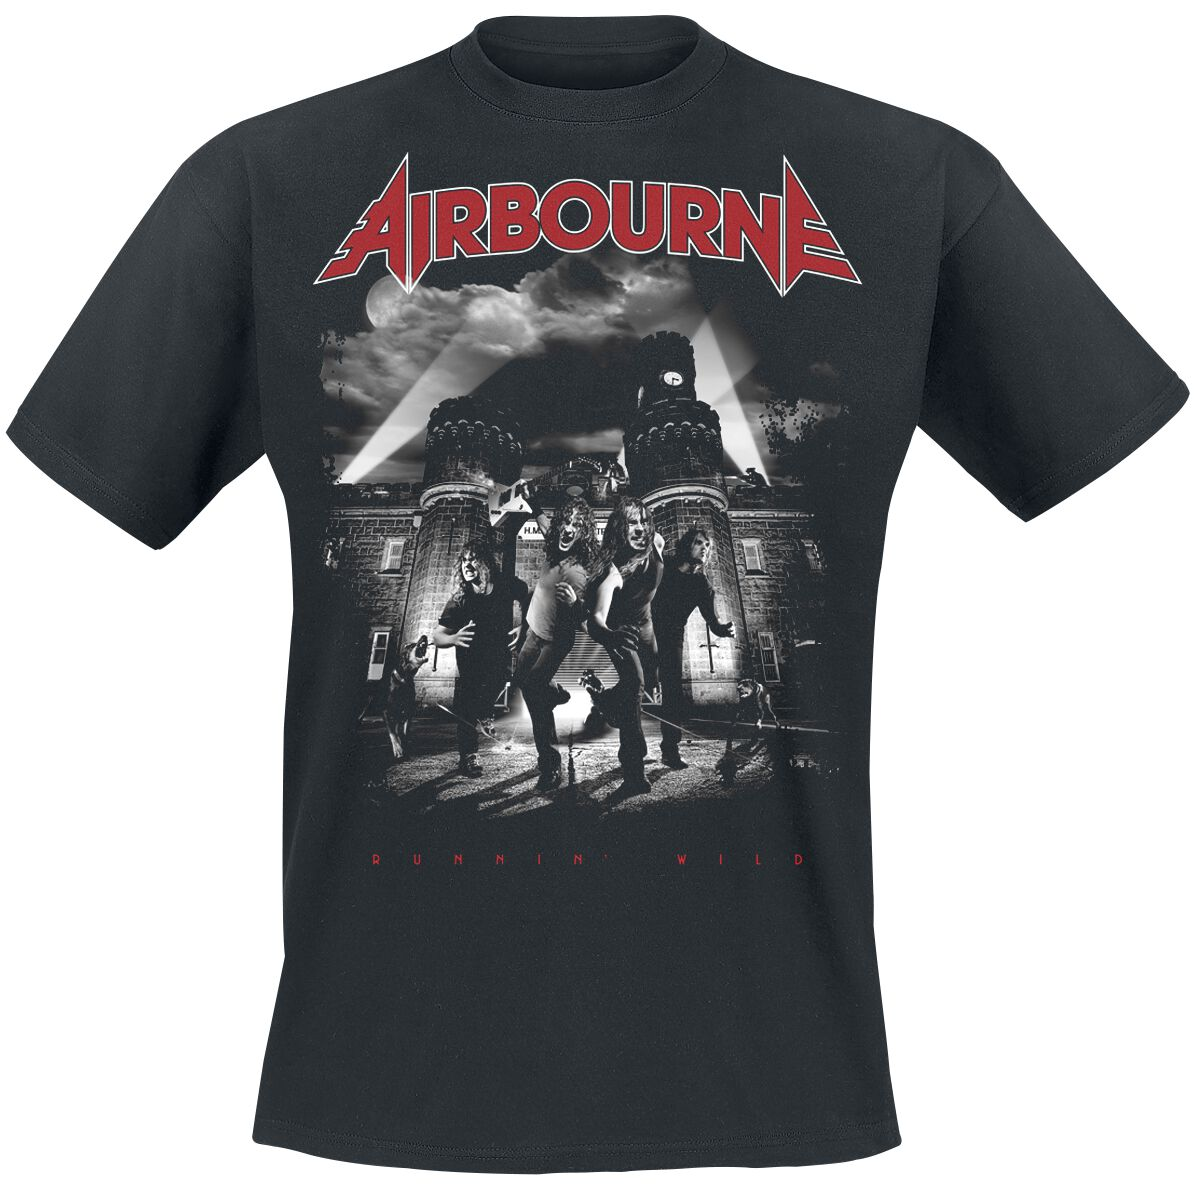 Zespoły - Koszulki - T-Shirt Airbourne Runnin' wild T-Shirt czarny - 373126